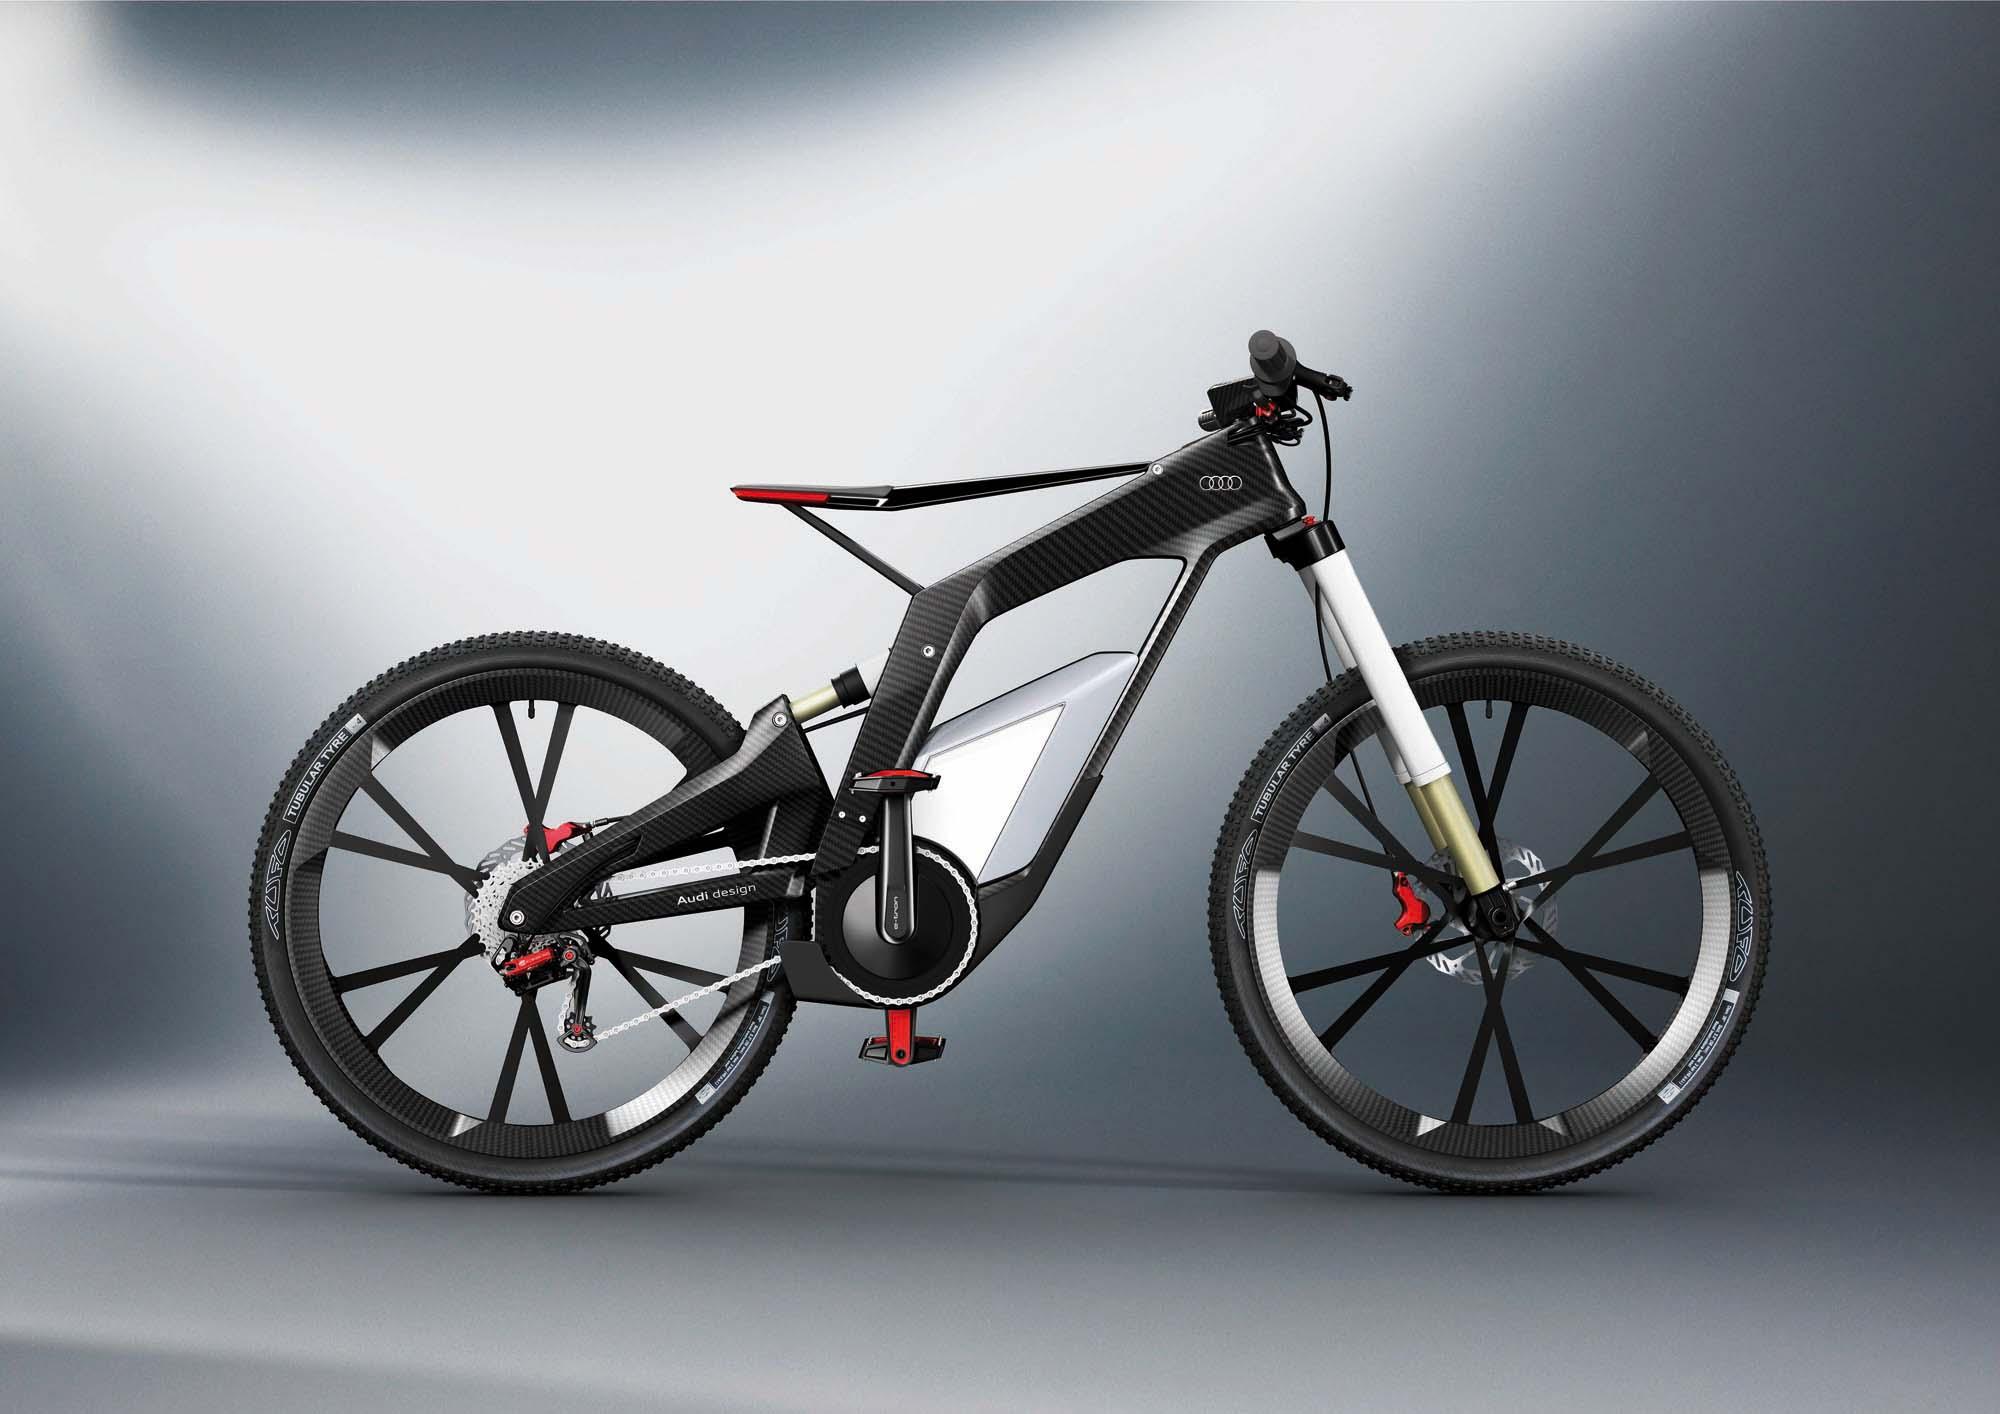 e-bike audi купить в спб